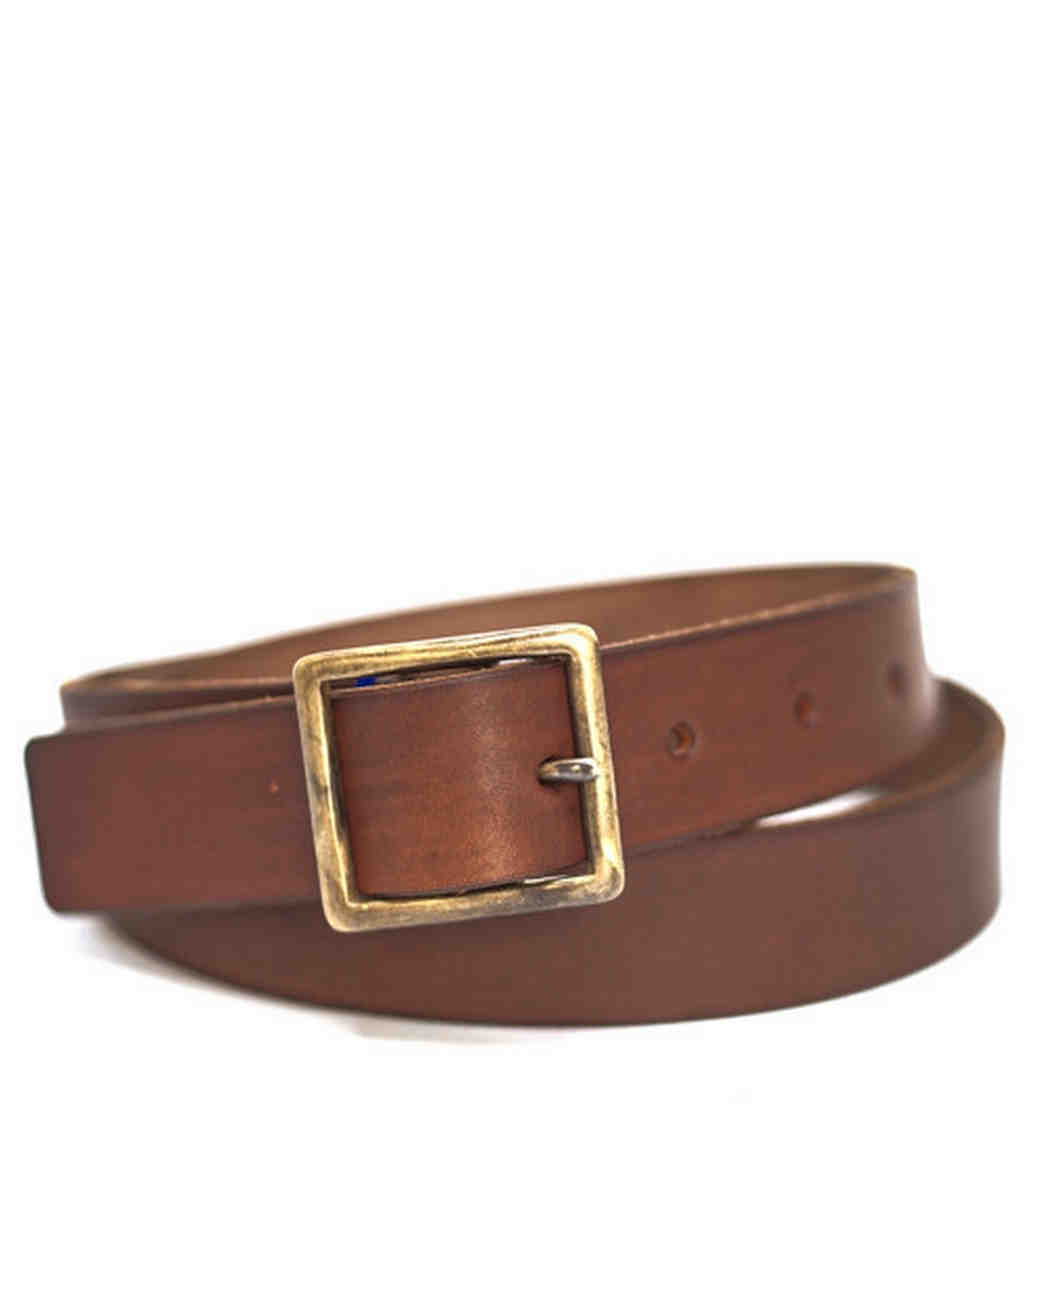 groomsmen-gift-ideas-half-hitch-leather-belt-0614.jpg